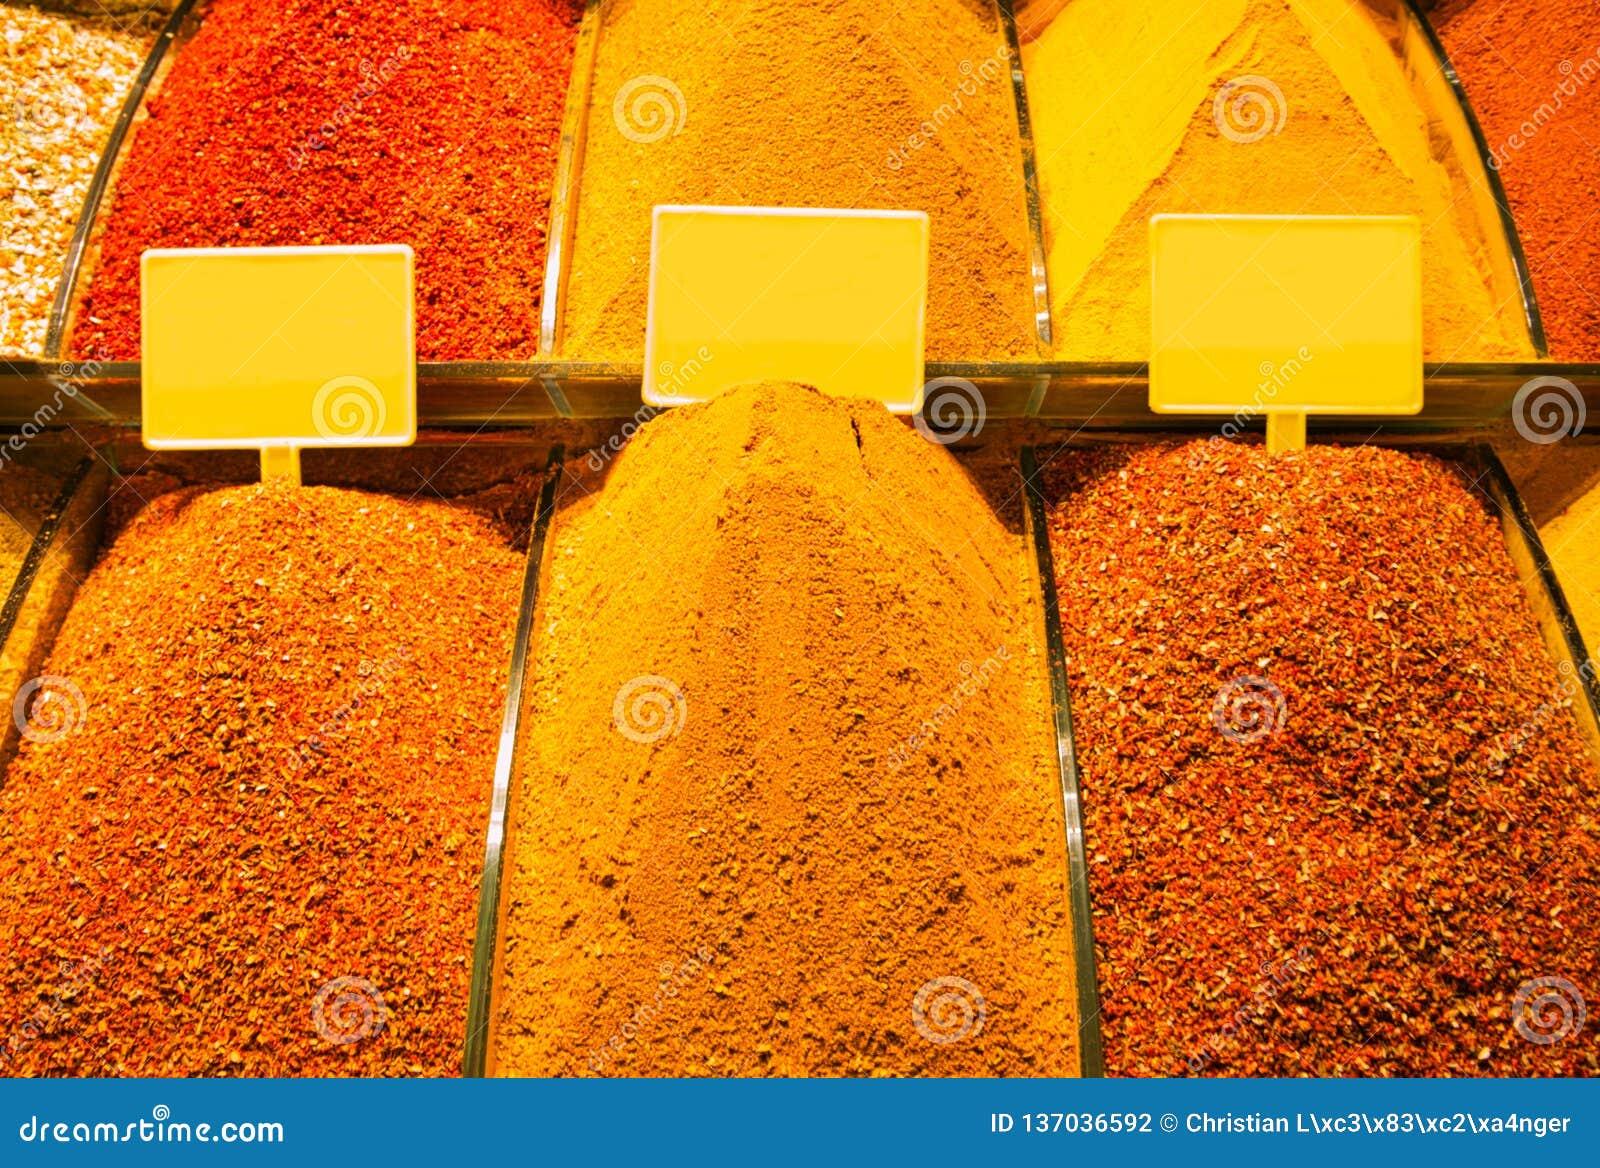 Venda de diversas especiarias no bazar árabe